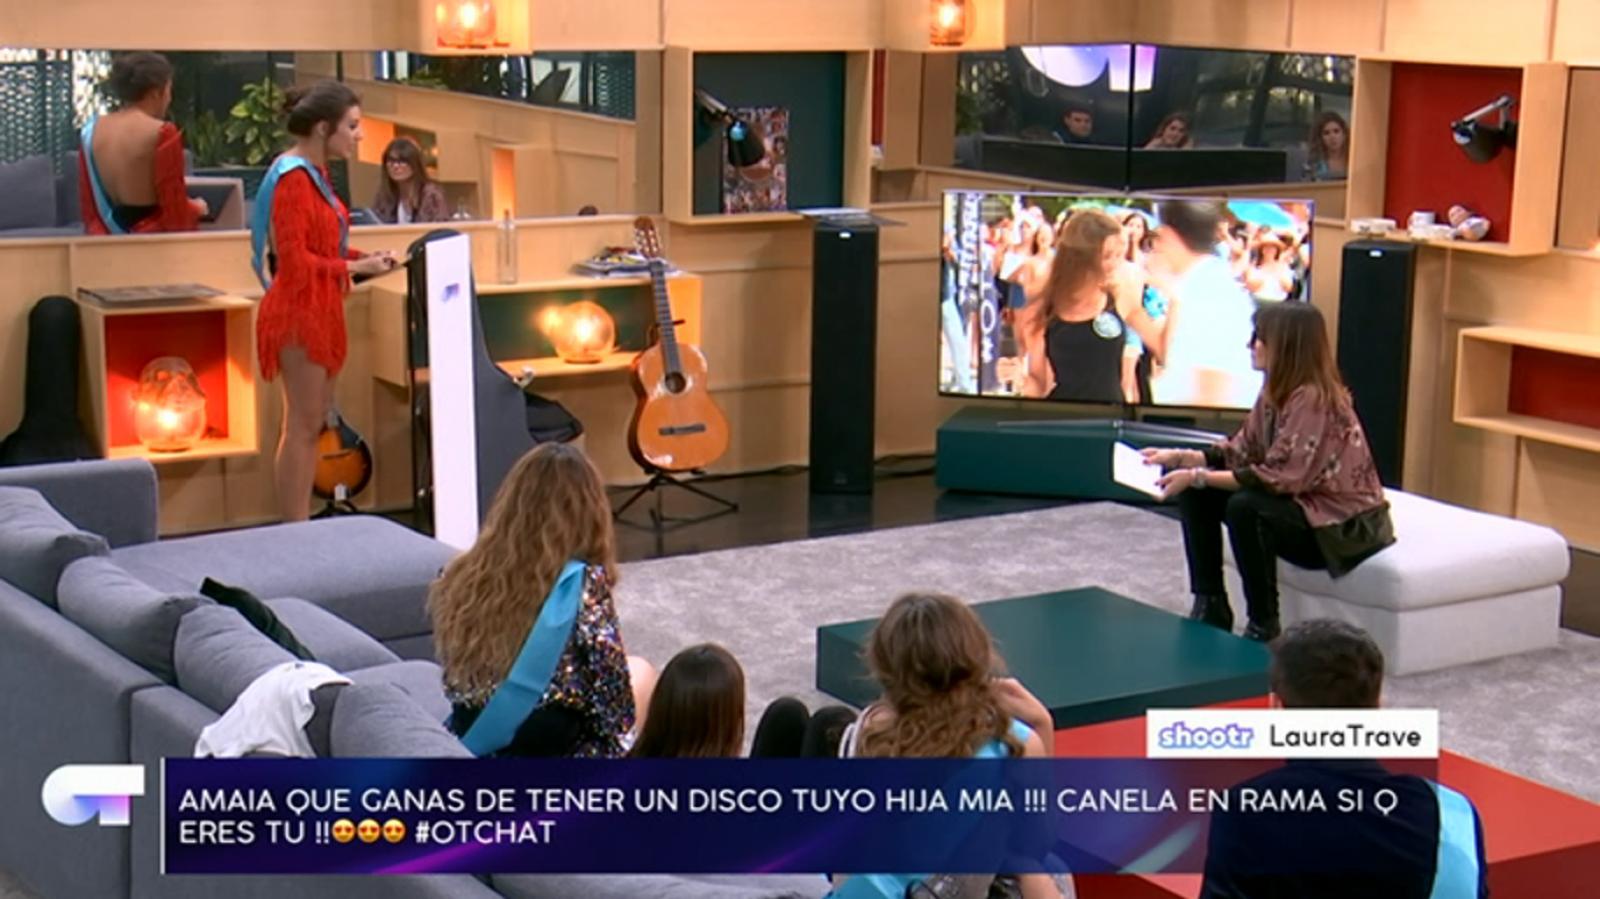 Noemí Galera, Amaia Romero, Miriam Rodríguez, Alfred García, and Aitana in El chat de OT (2017)